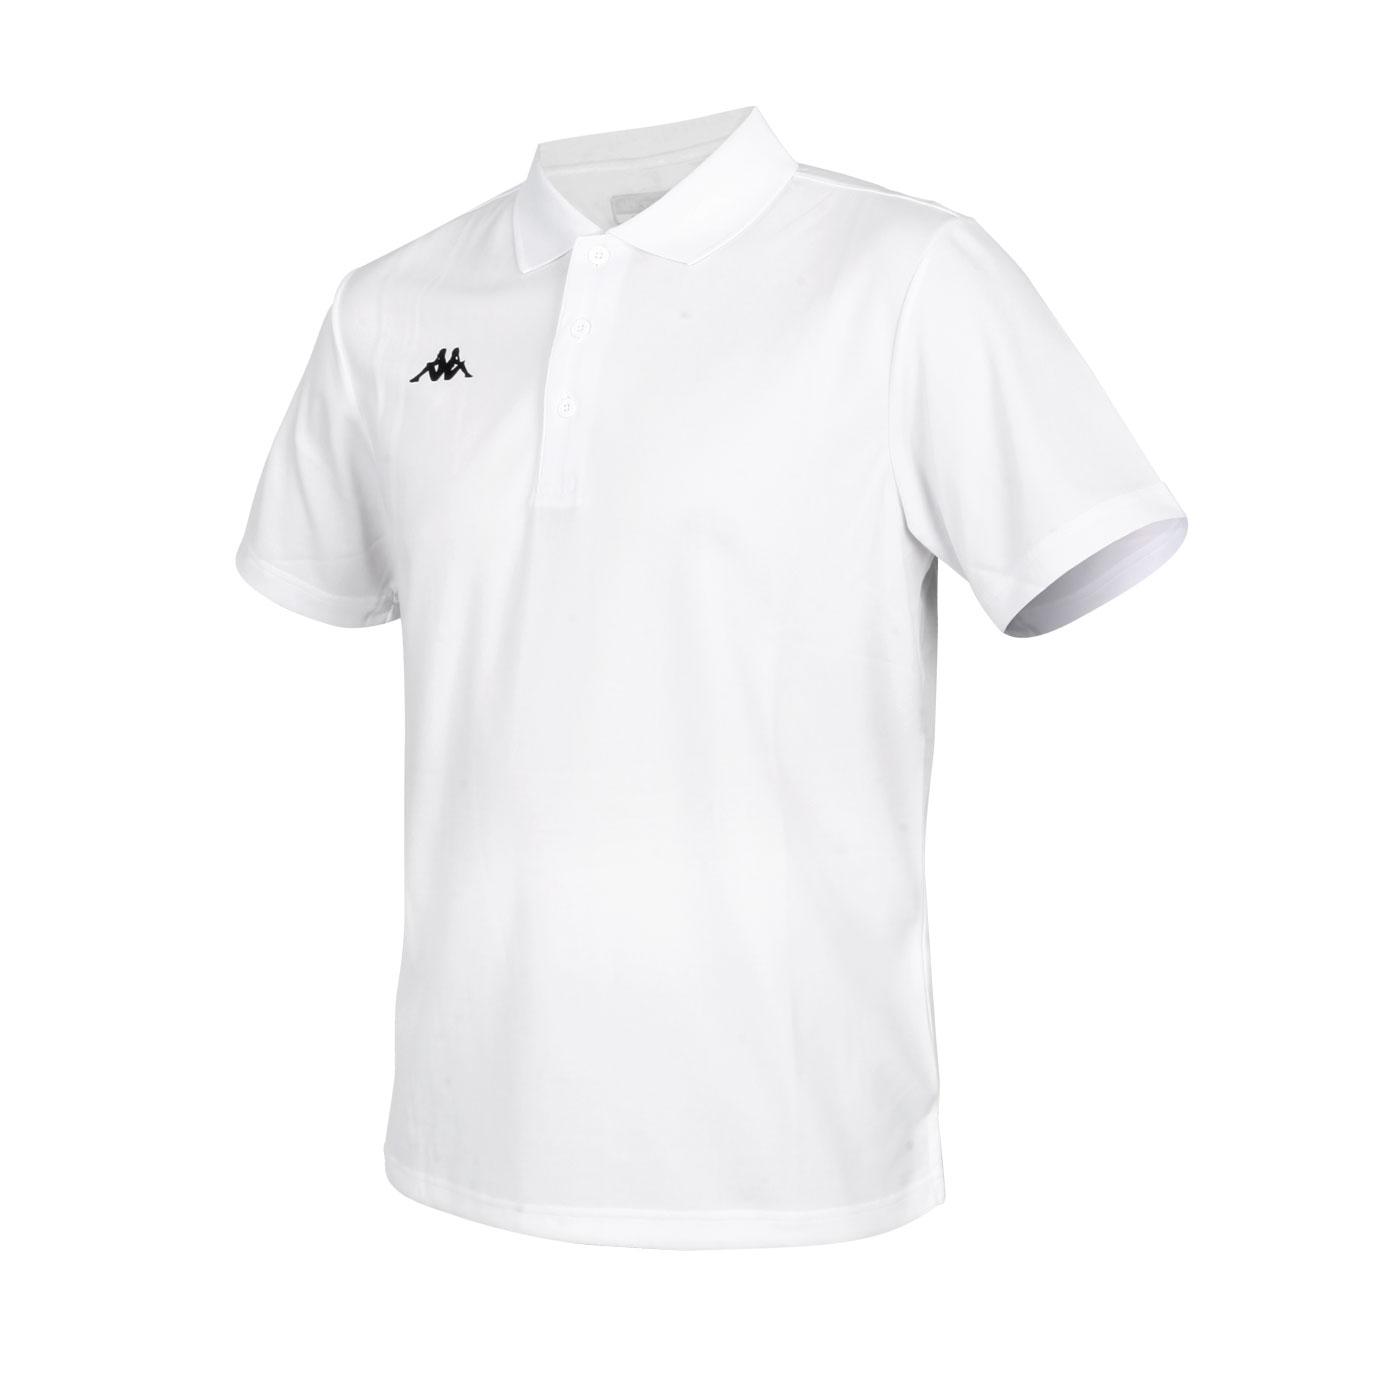 KAPPA 男款K4T短袖POLO衫 321762W-001 - 白黑